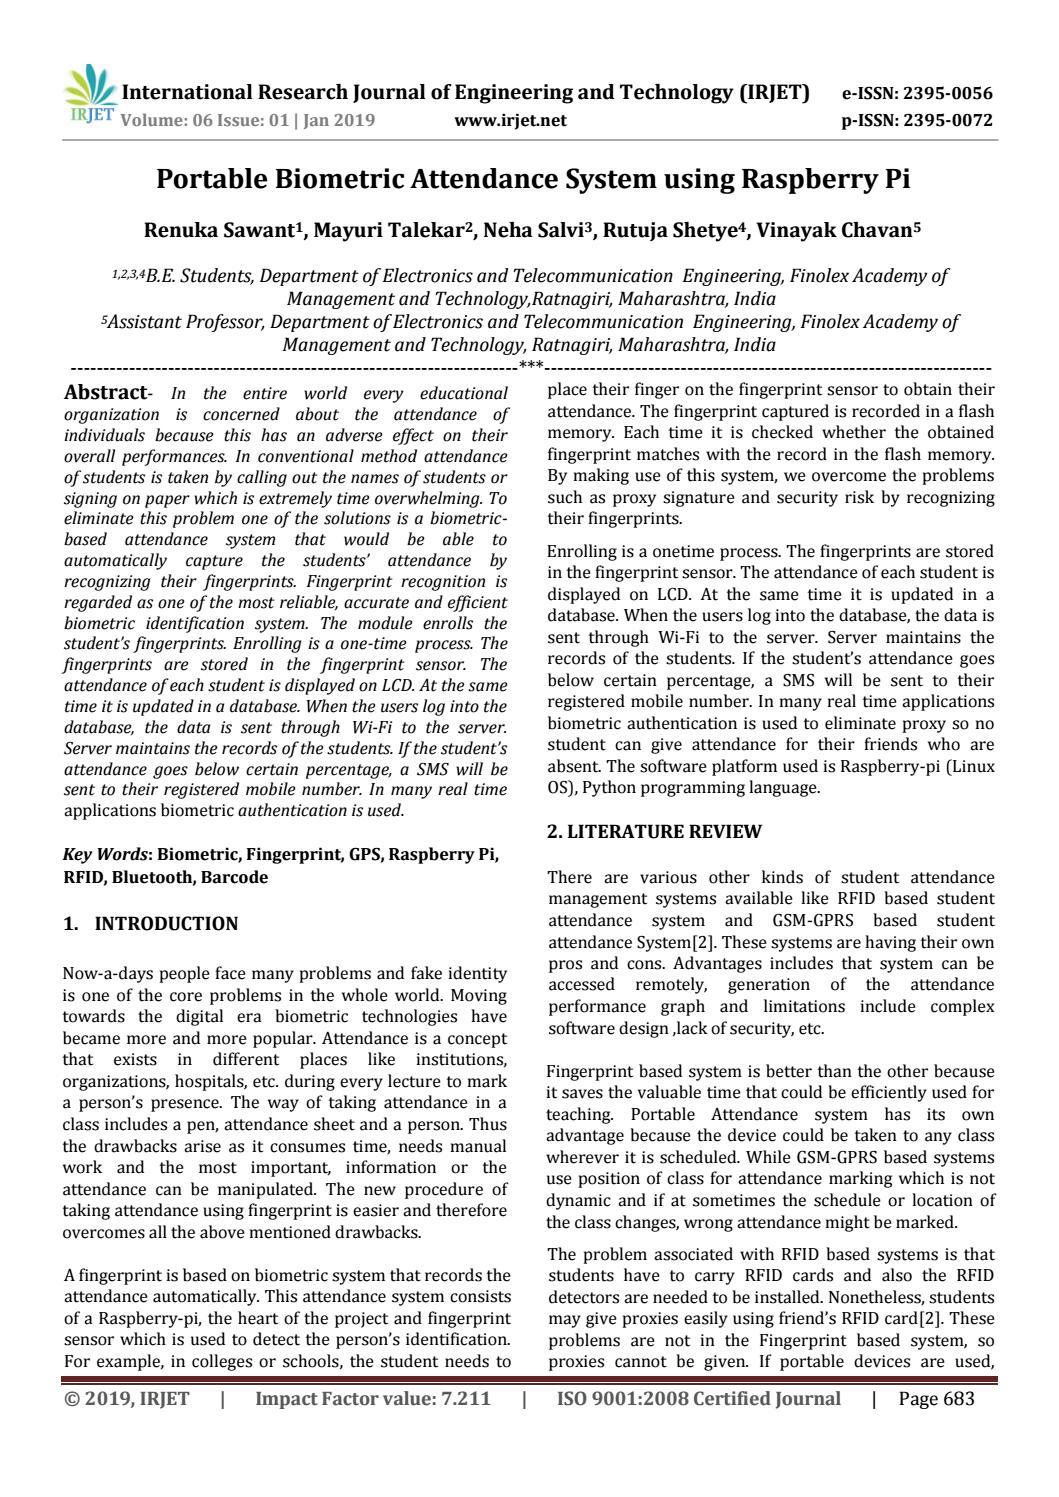 IRJET- Portable Biometric Attendance System using Raspberry Pi by